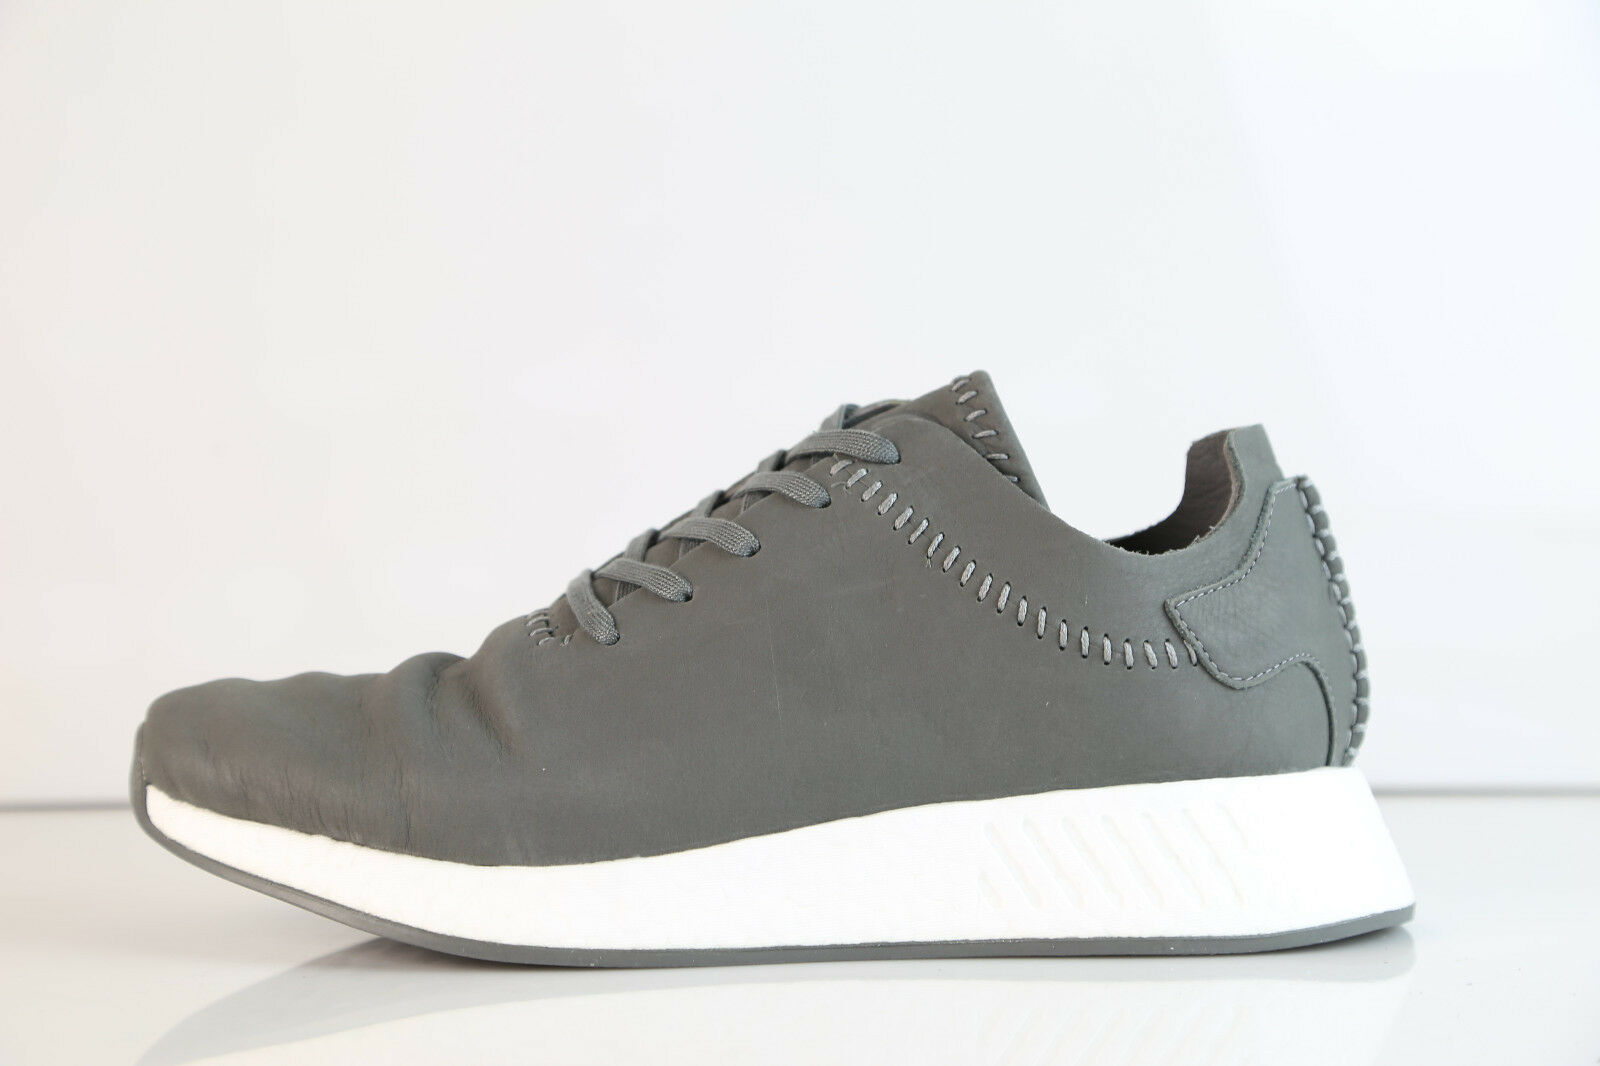 Adidas x flügel + hörner asche nmd r2 graue asche hörner bb3117 5.5-11.5 auftrieb - rf wang nomad 48c24a